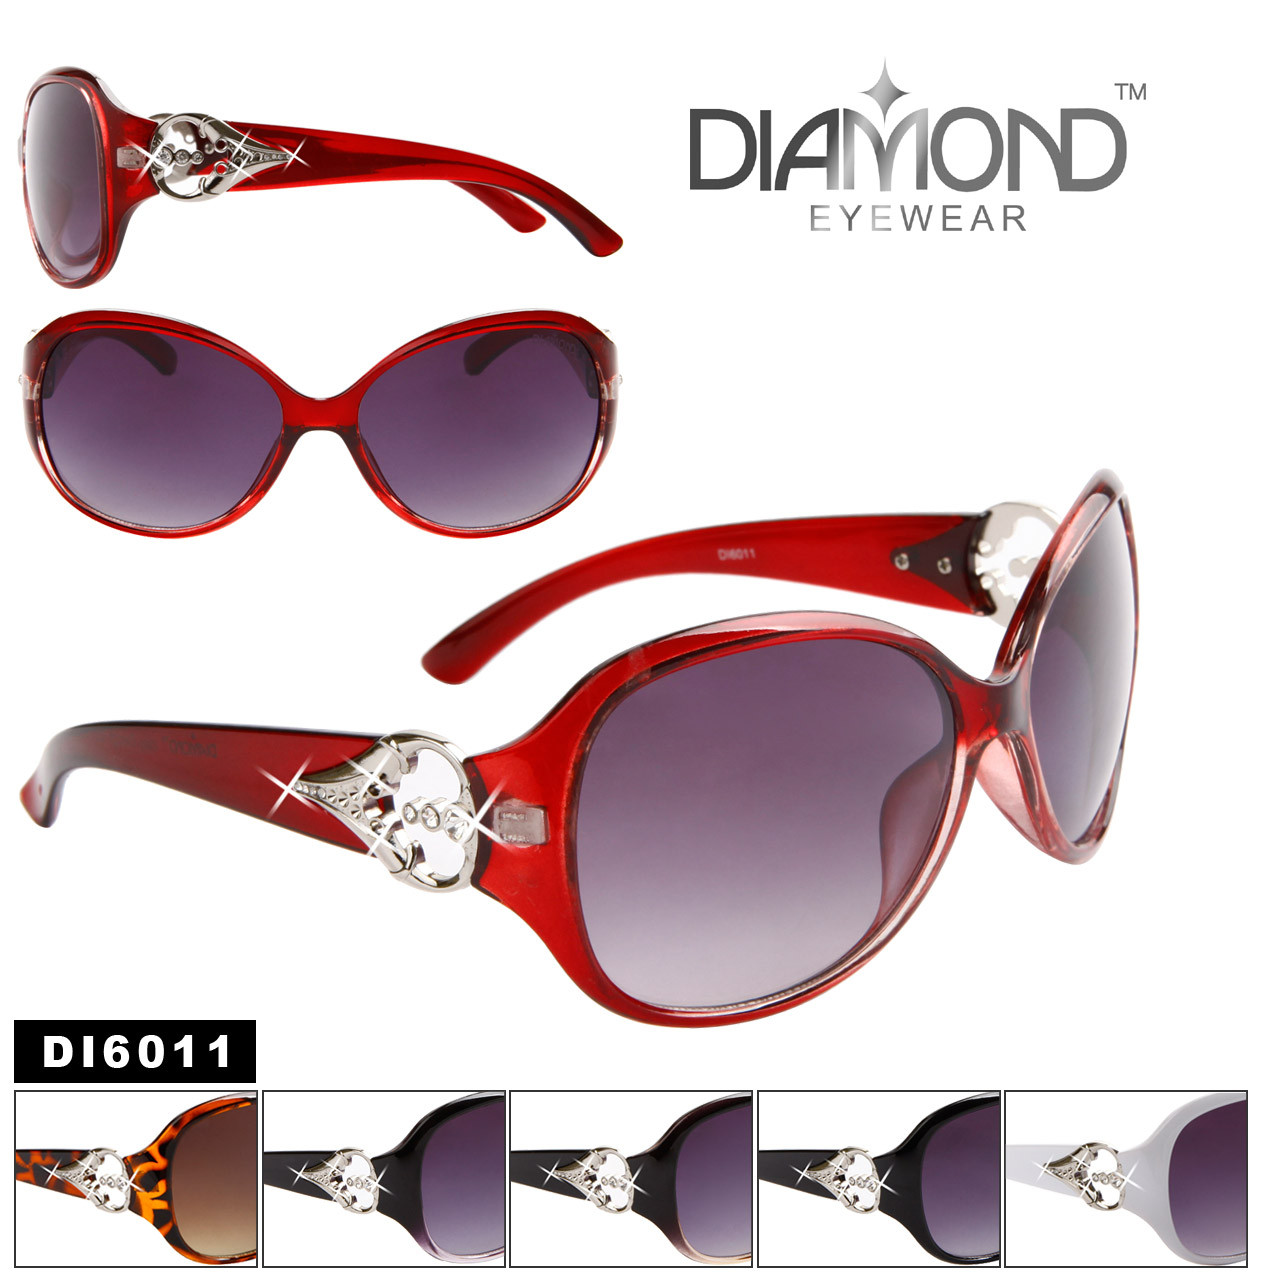 Wholesale Diamond™ Eyewear Sunglasses - DI6011